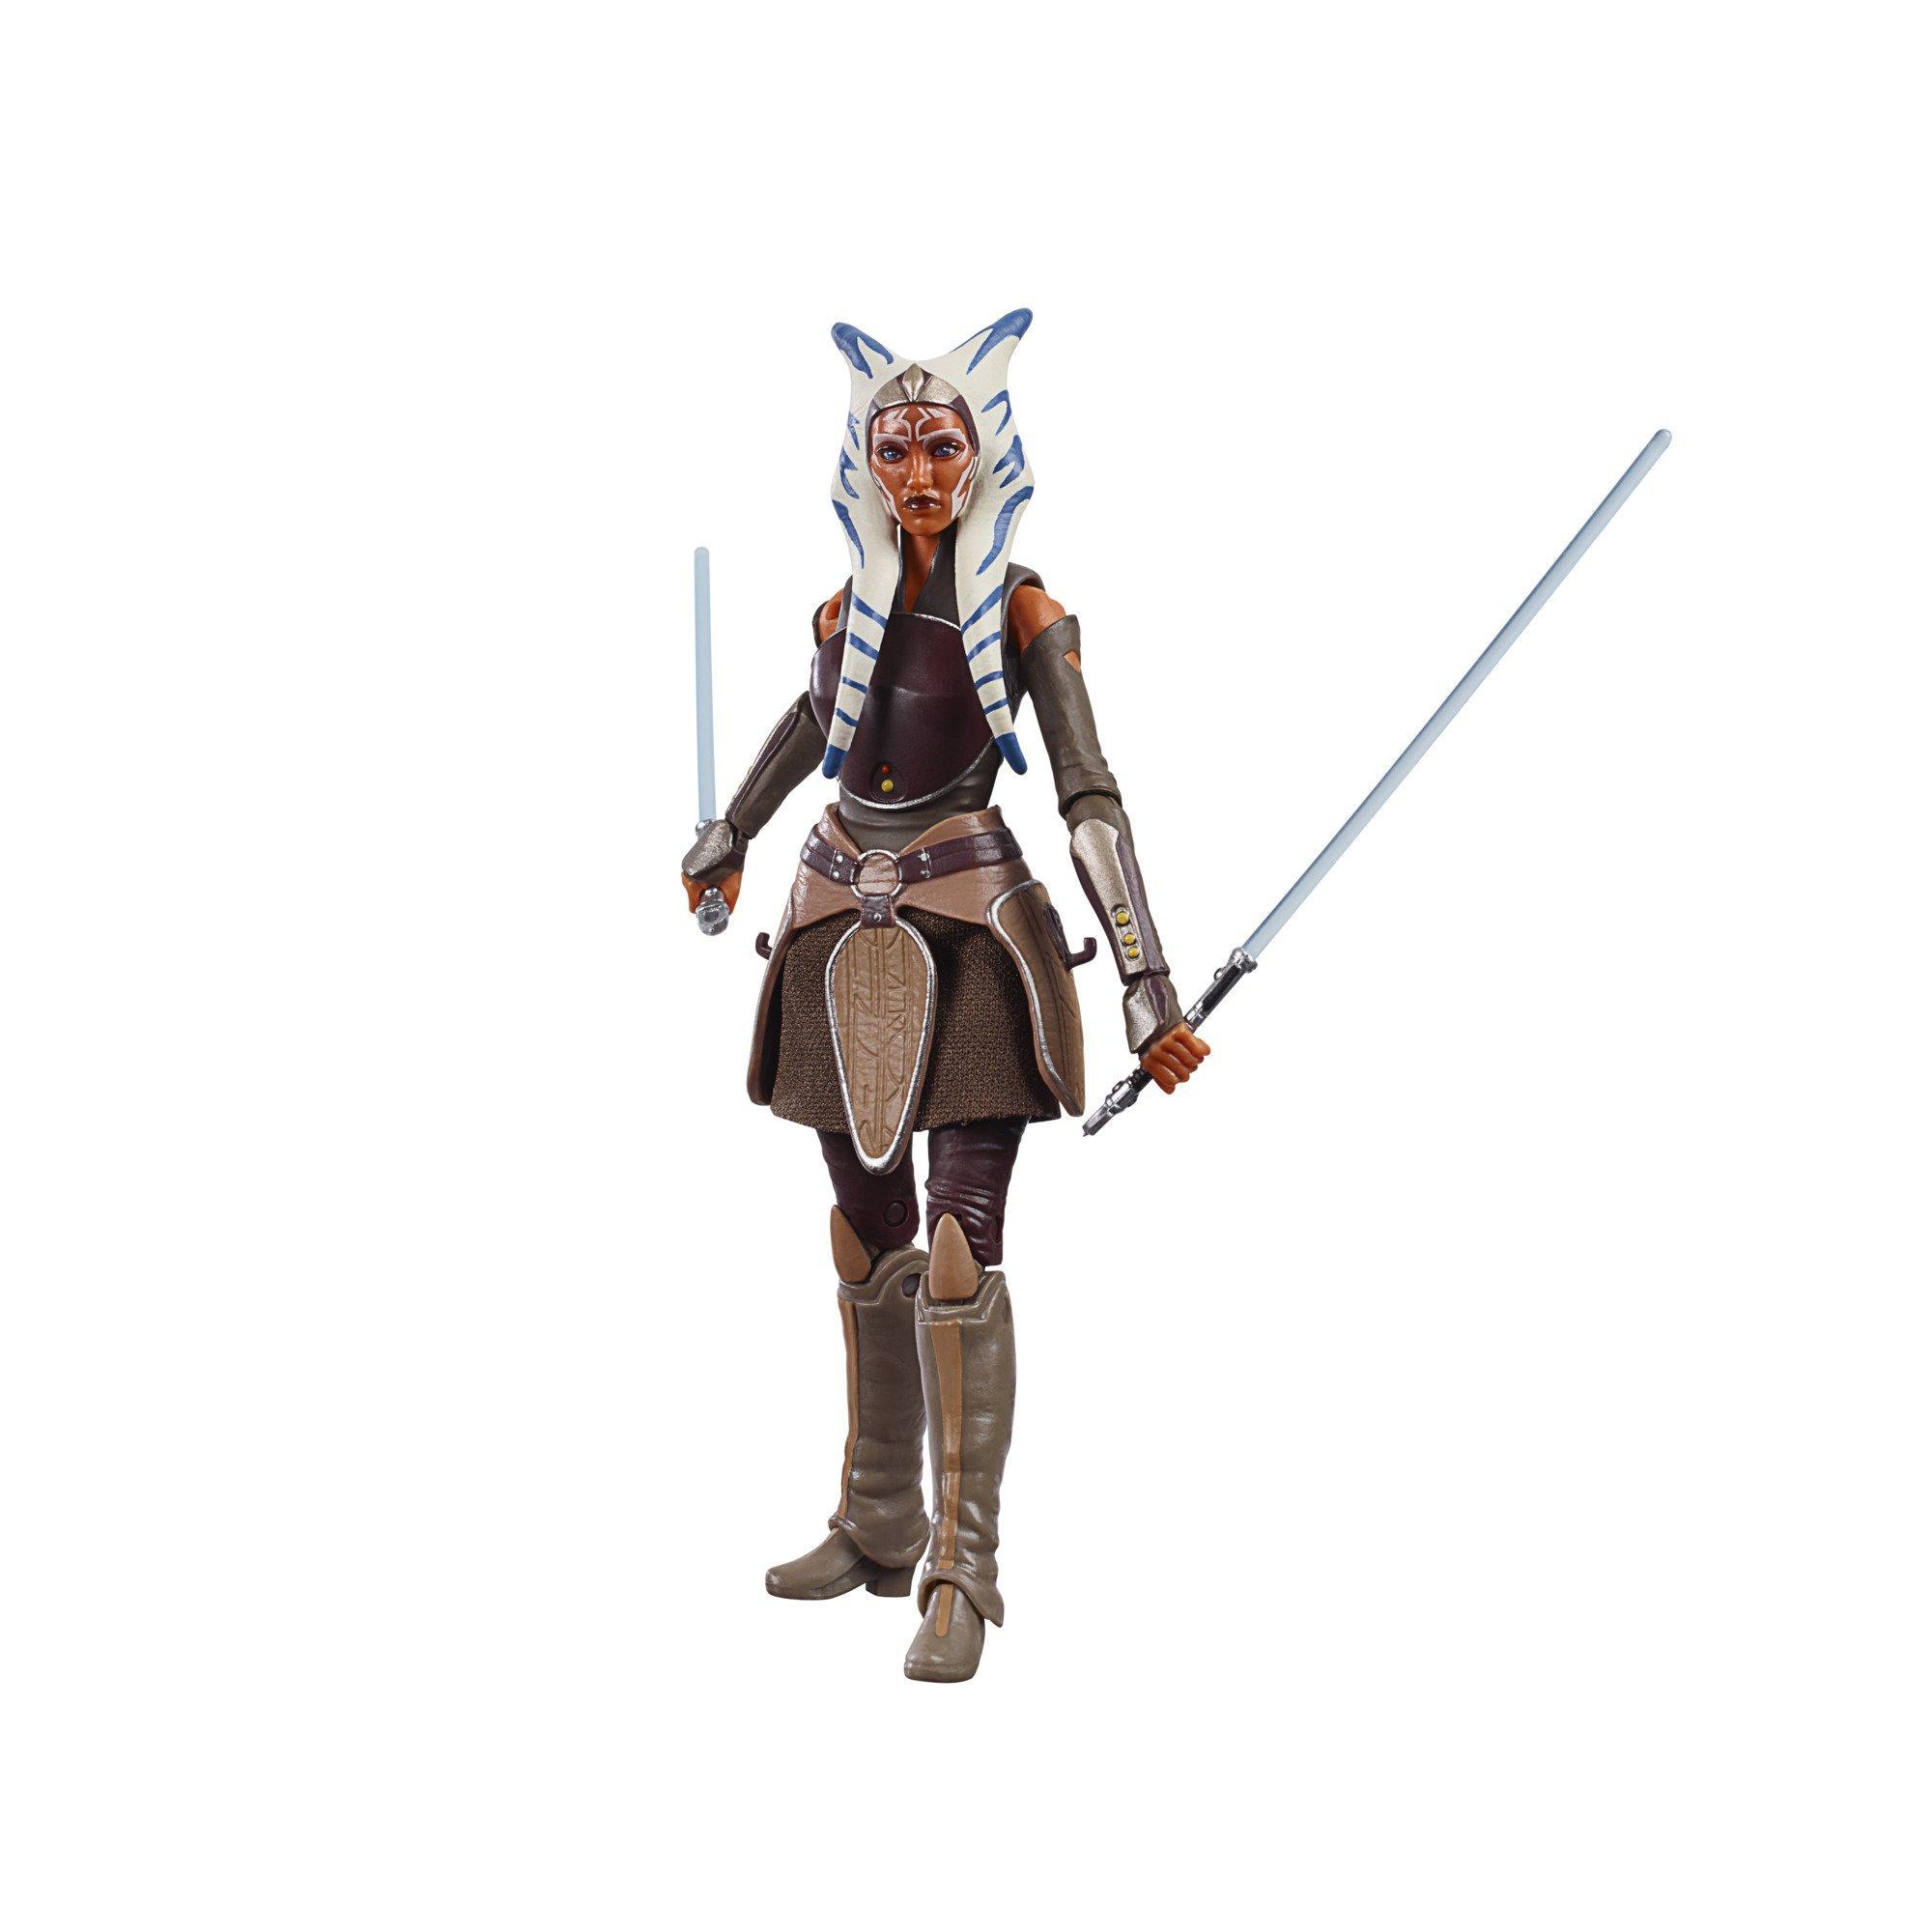 Star Wars Rebels Ahsoka Tano The Black Series Action Figure